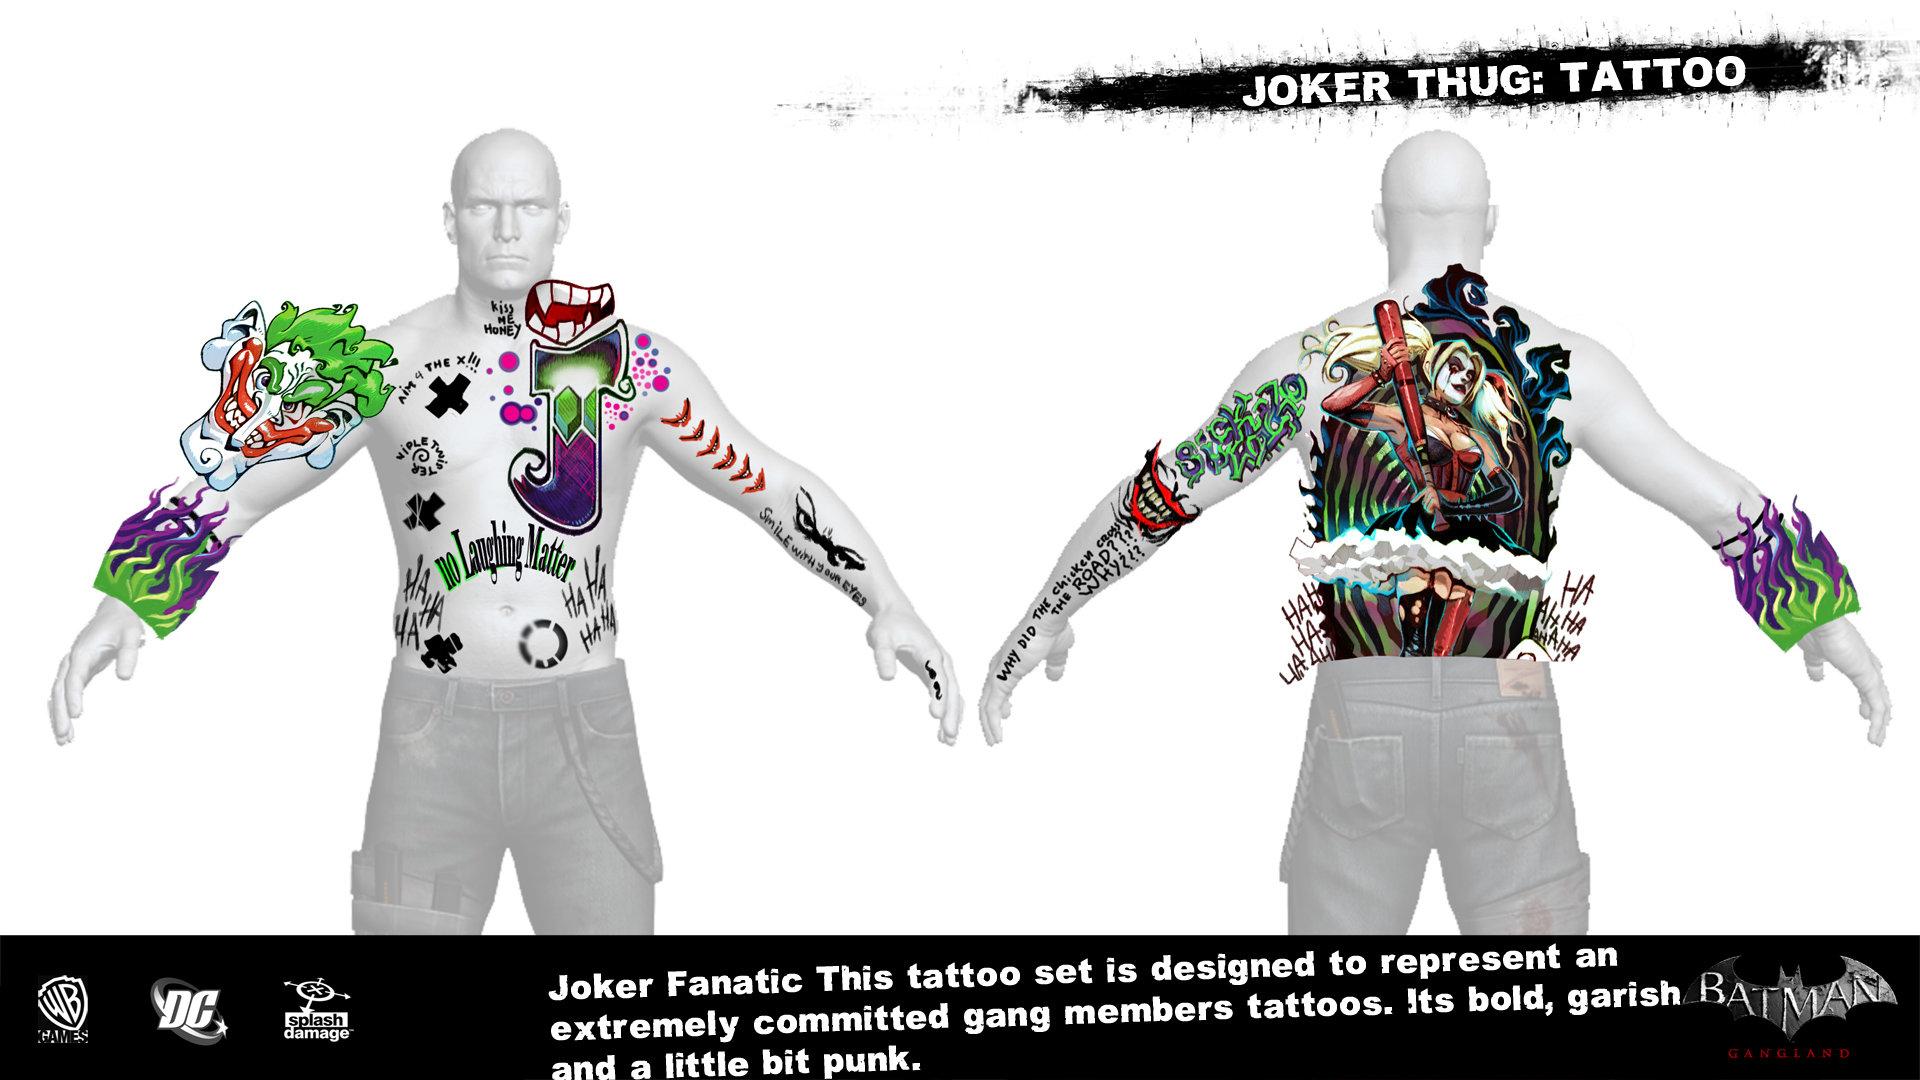 Manuel augusto dischinger moura splashdamage joker thug tattoo 1